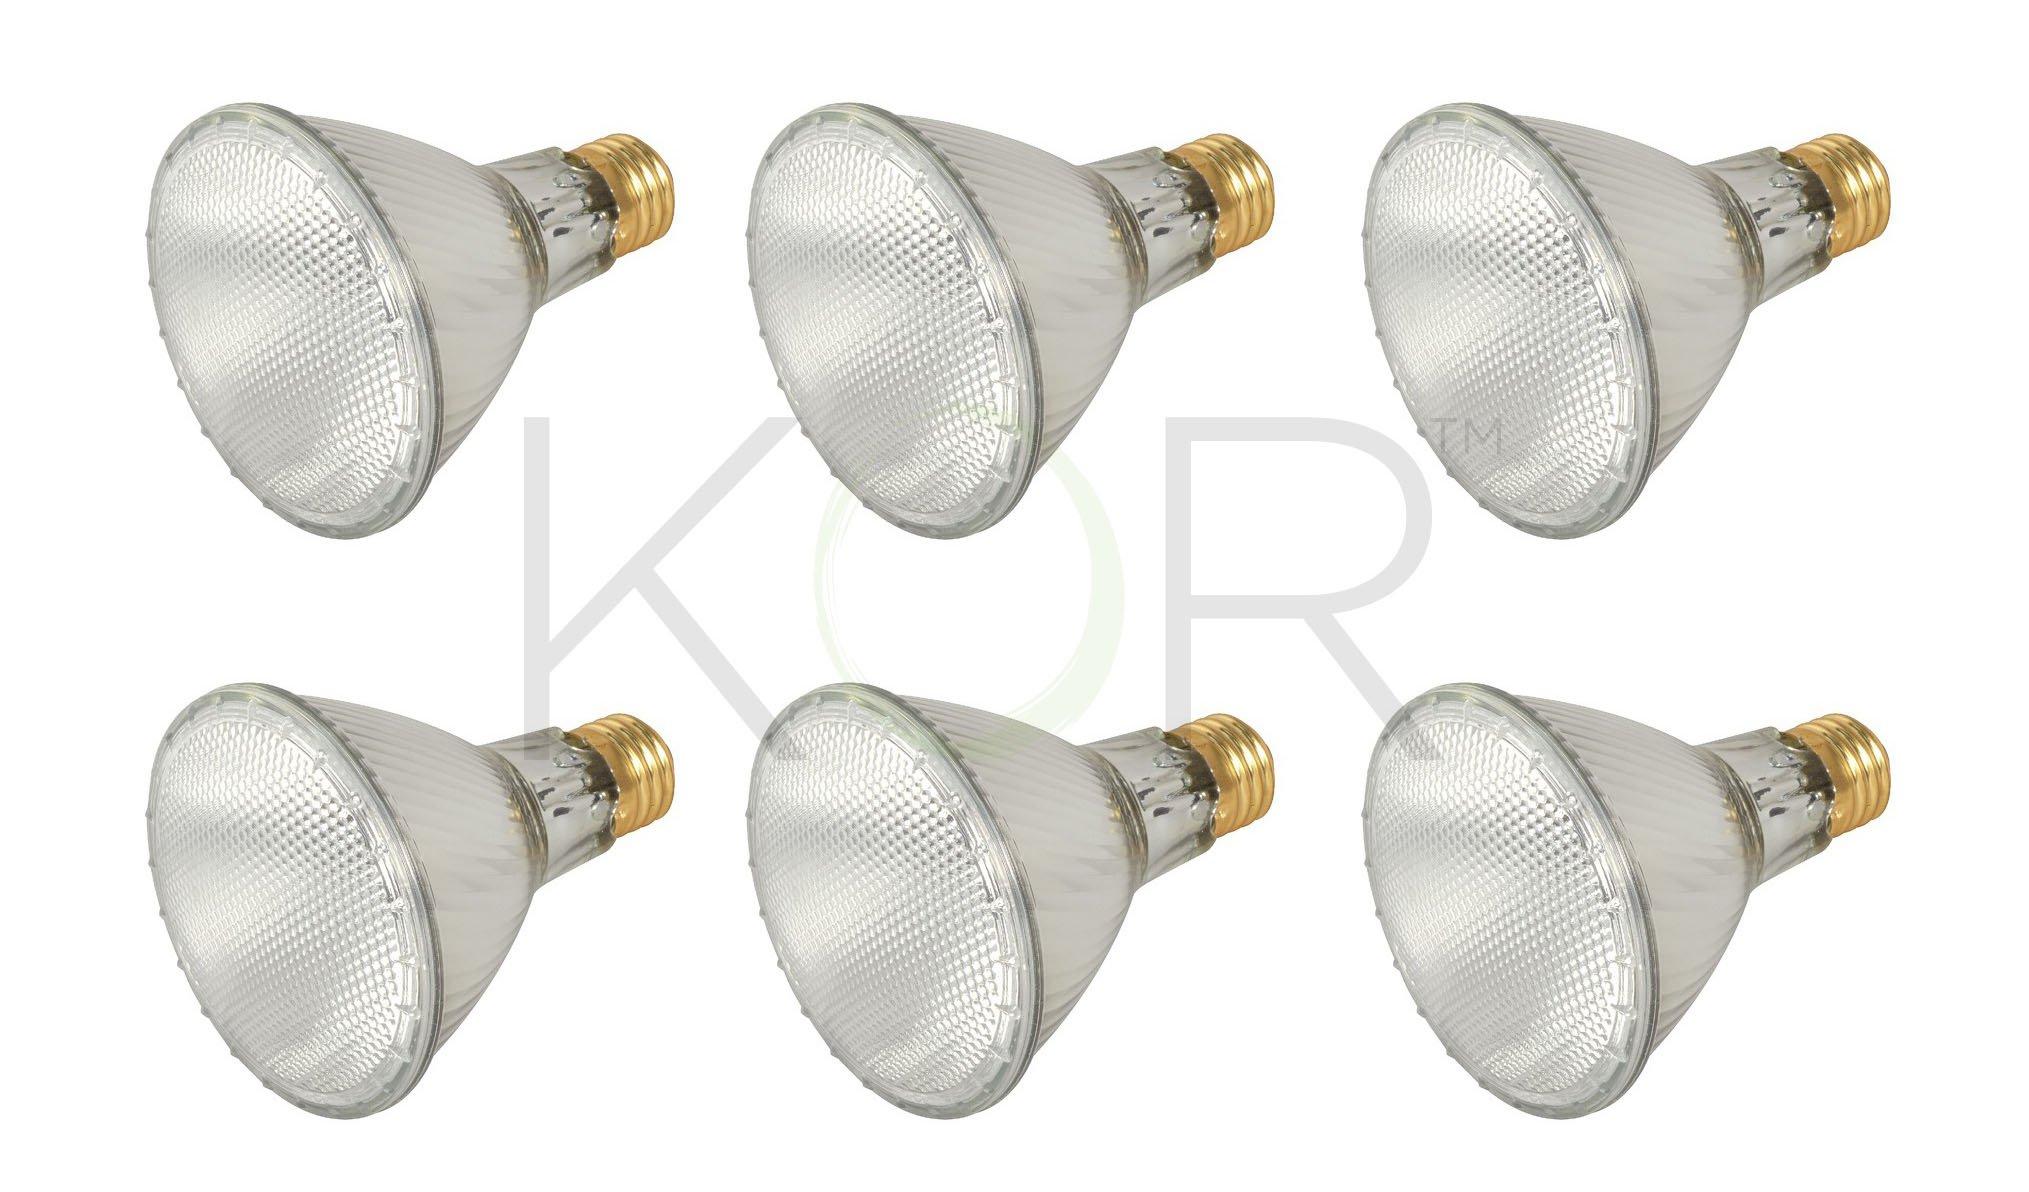 (Pack Of 6)60PAR30L/FL 120V - 60 Watt High Output (75W Replacement) PAR30 Long Neck Flood - 120 Volt Eco Halogen Light Bulbs - Dimmable - Indoor / Outdoor Use